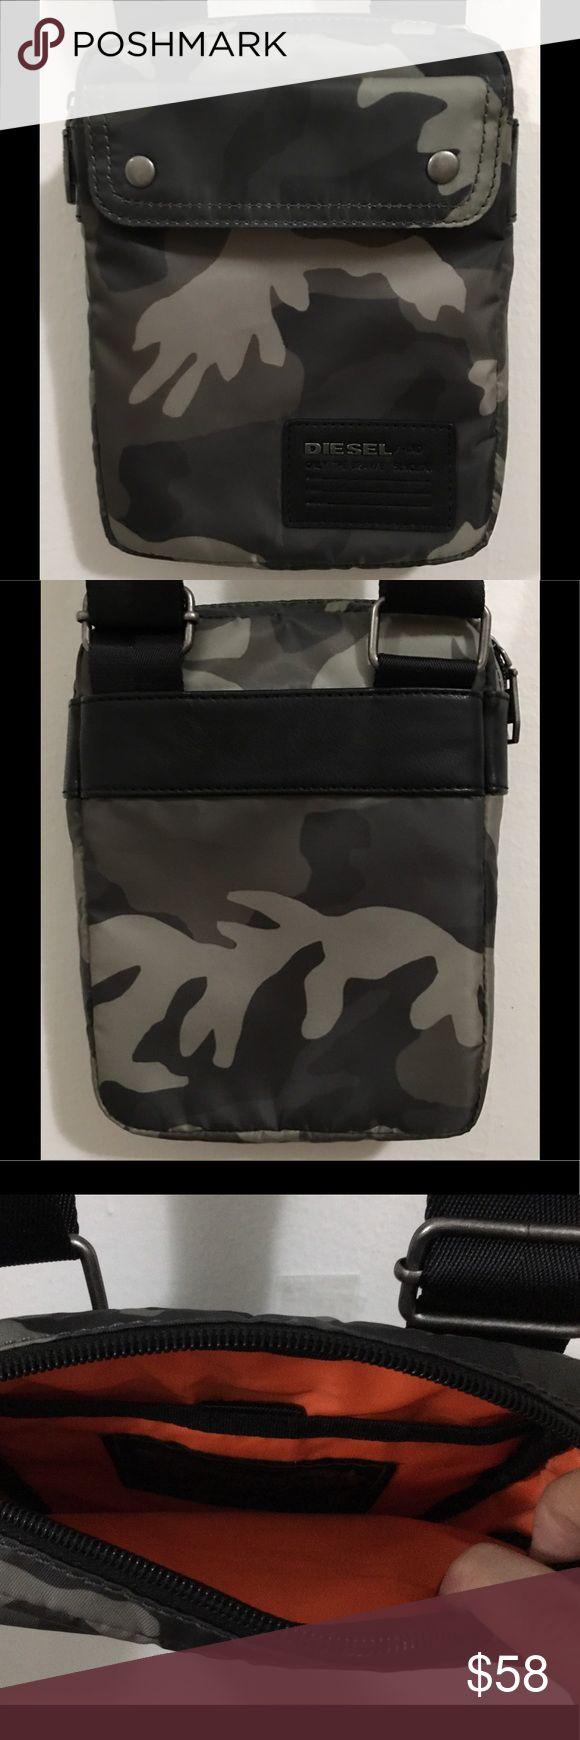 Diesel Flight Bag Popular Diesel Cross Body Bag, Durable Fabric Outer, Adjustable Shoulder Strap, Zip Top Closure, Black/Grey Camo, 99%Polyster, Almost New, 2Times used Diesel Bags Crossbody Bags